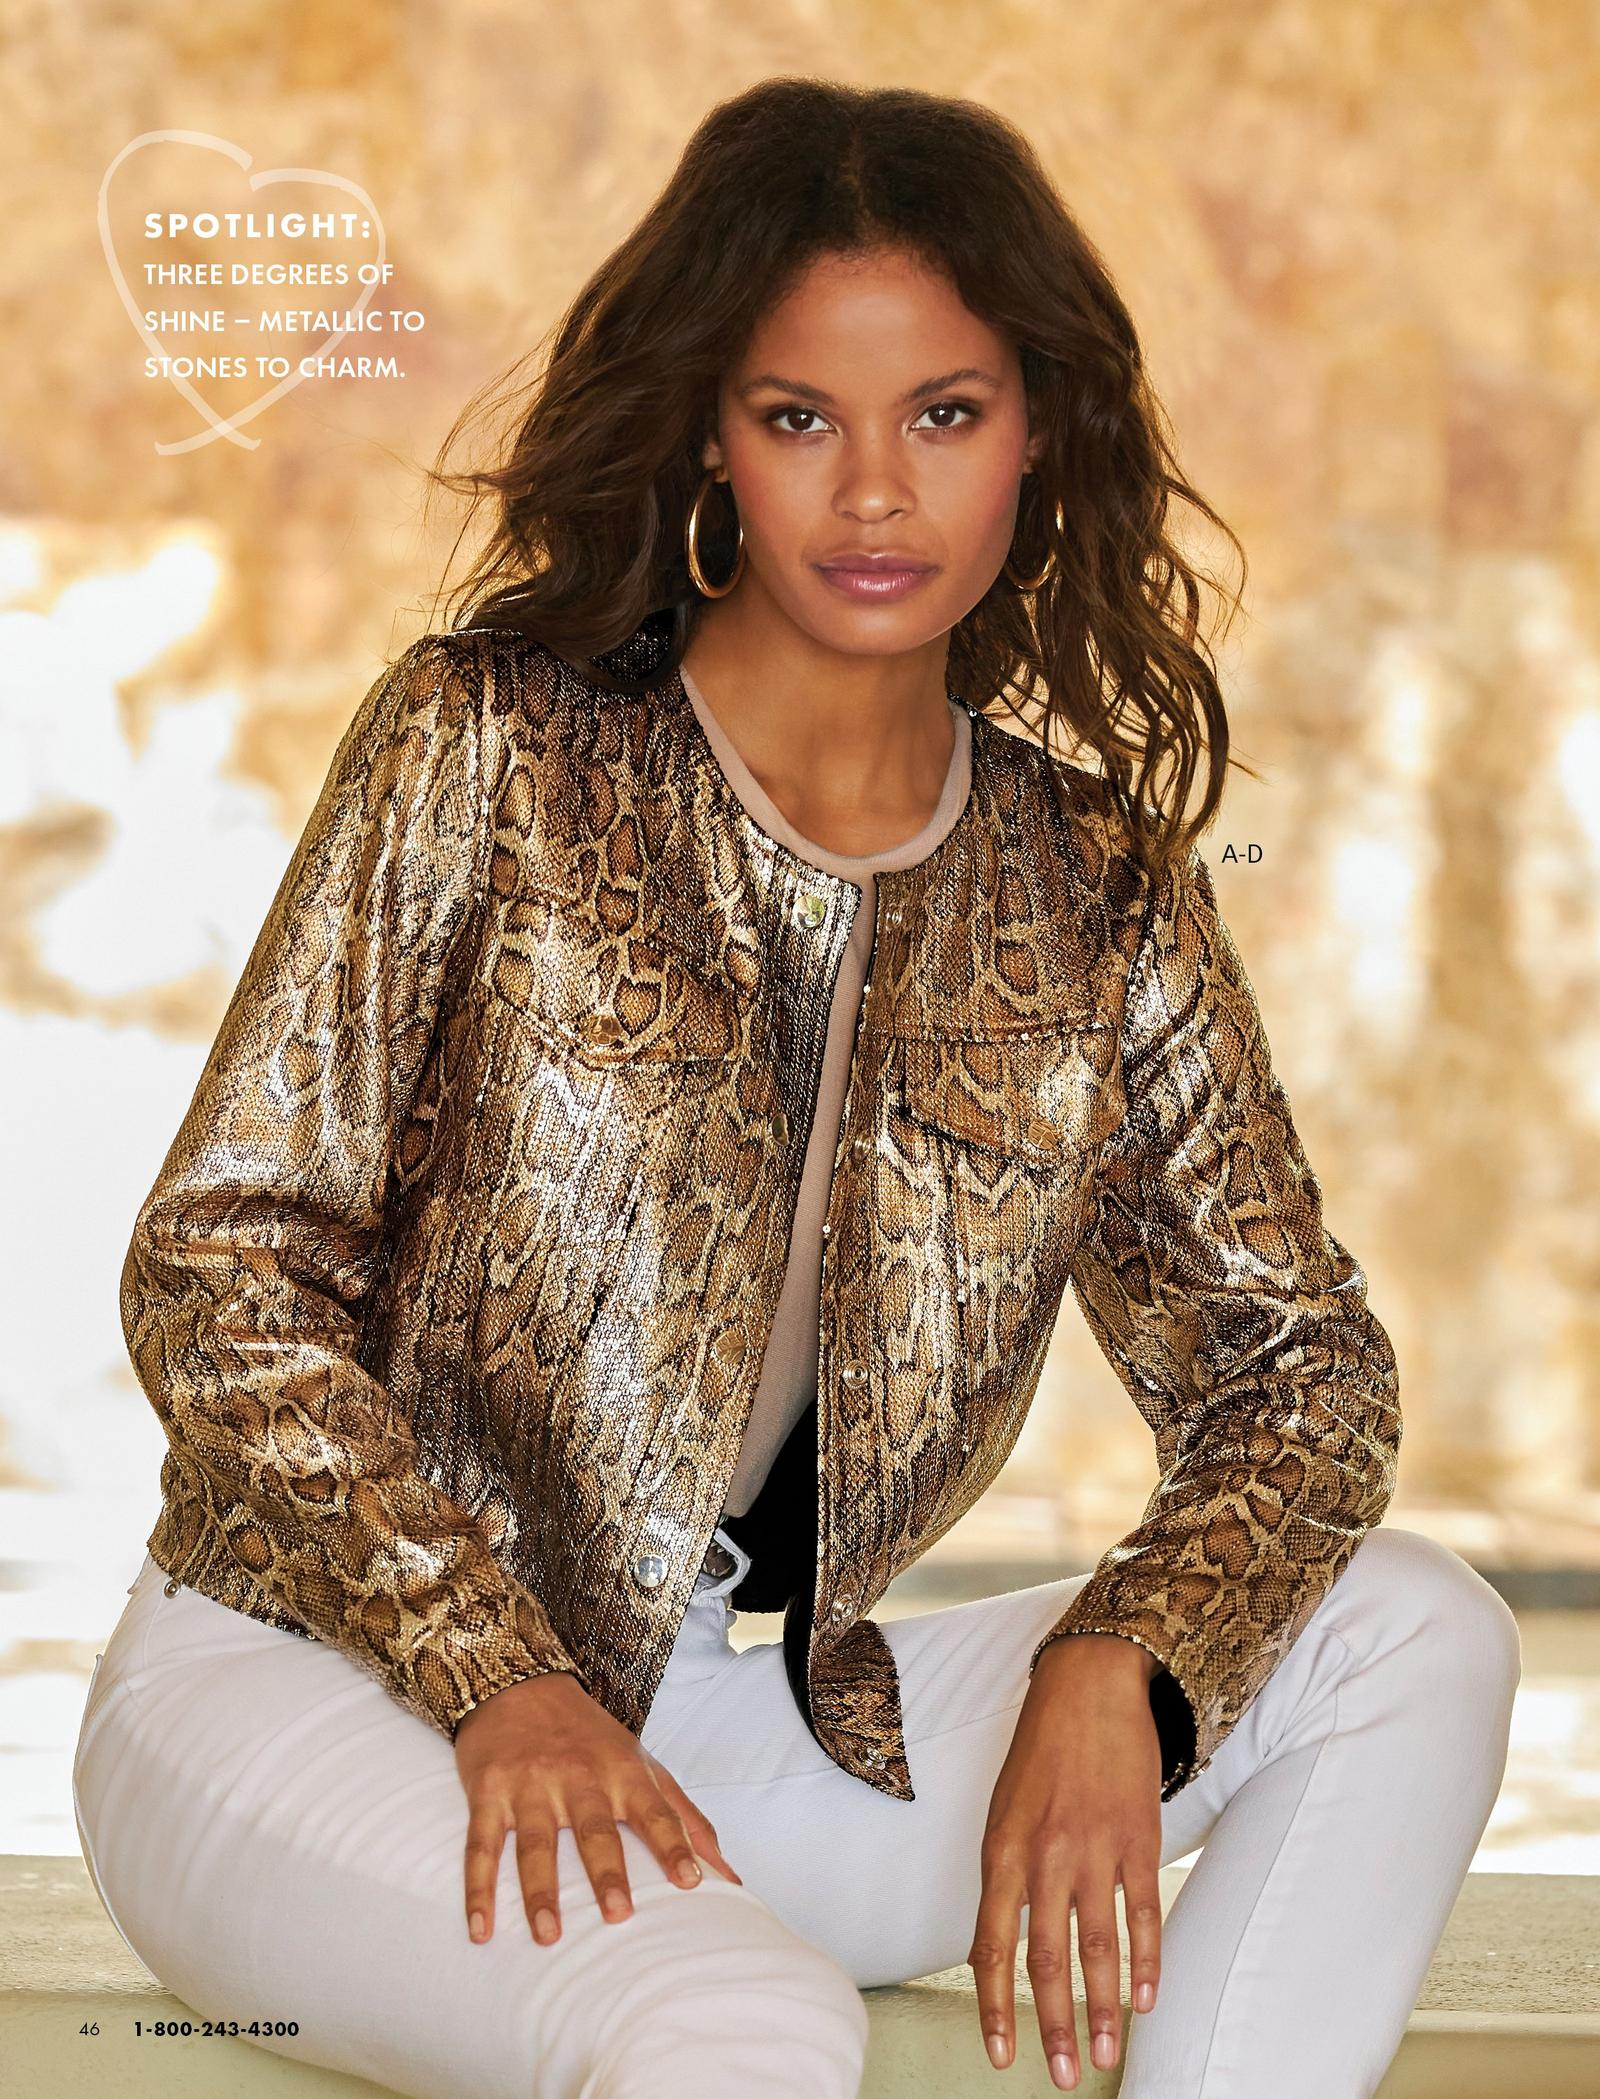 model wearing a gold metallic snake print jacket, tan top, gold hoop earrings, and white jeans.